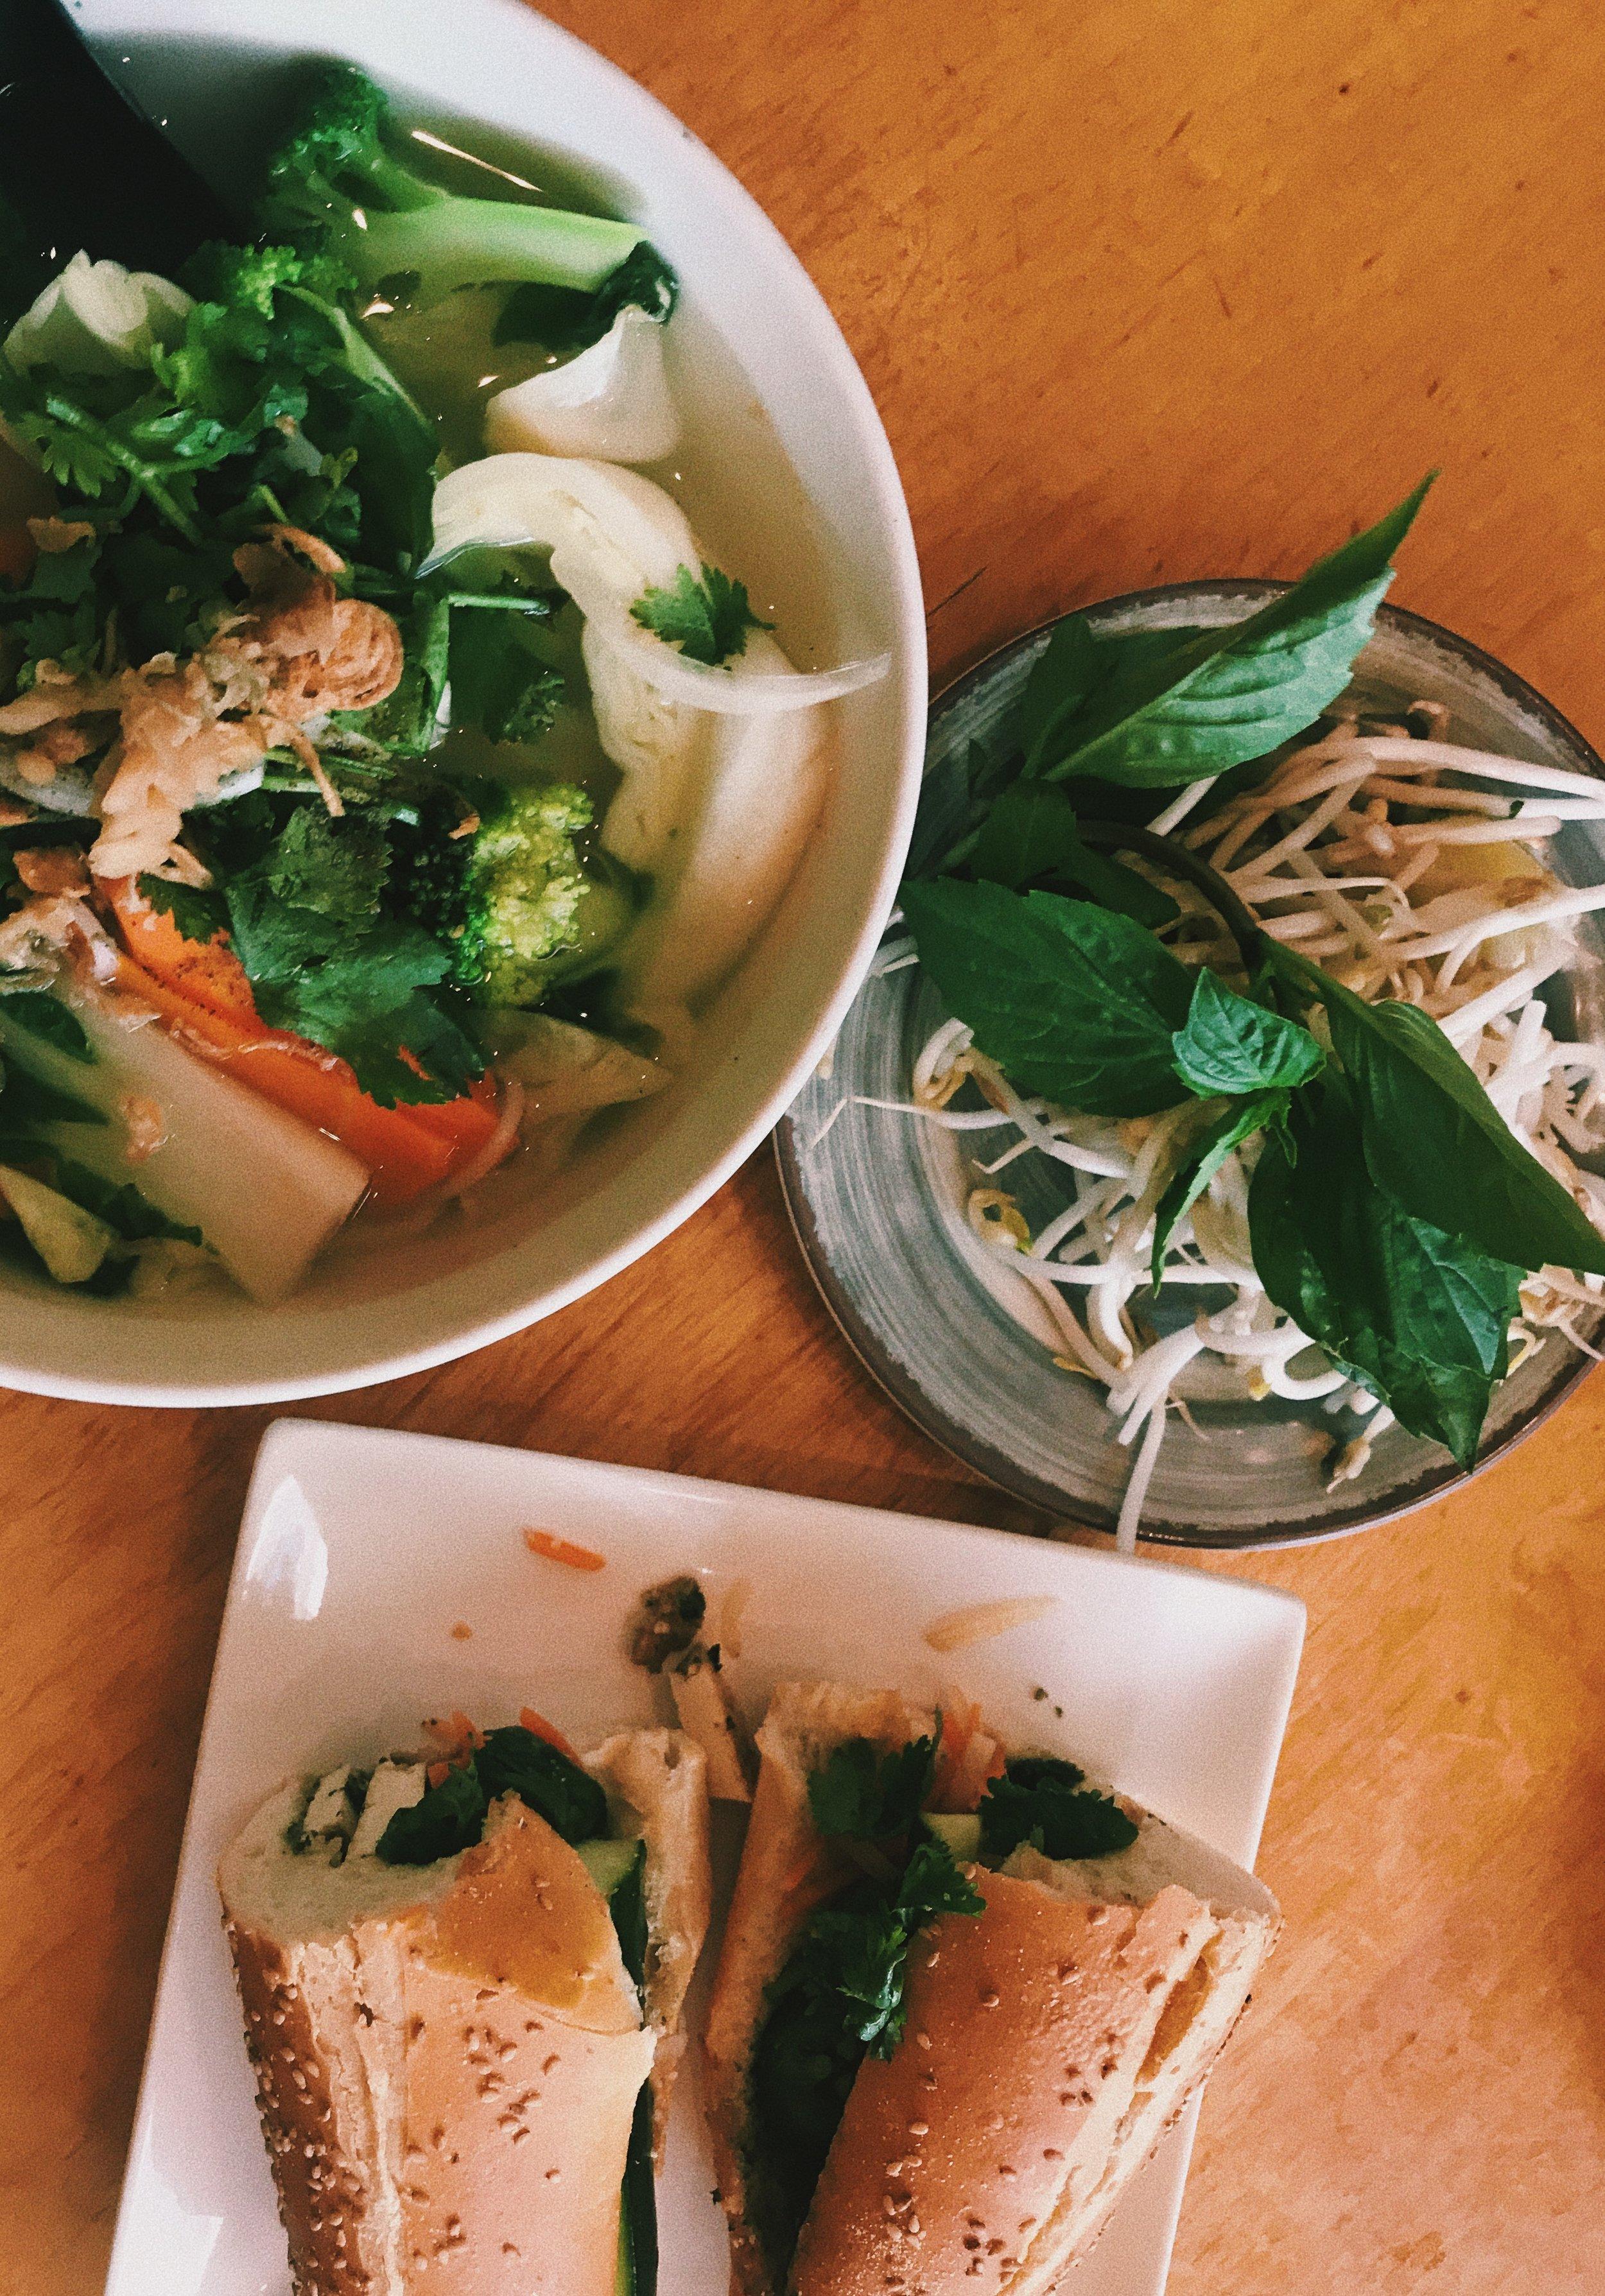 The Bronx Vegan Eats: Vegan Pho + Bahn Mi -